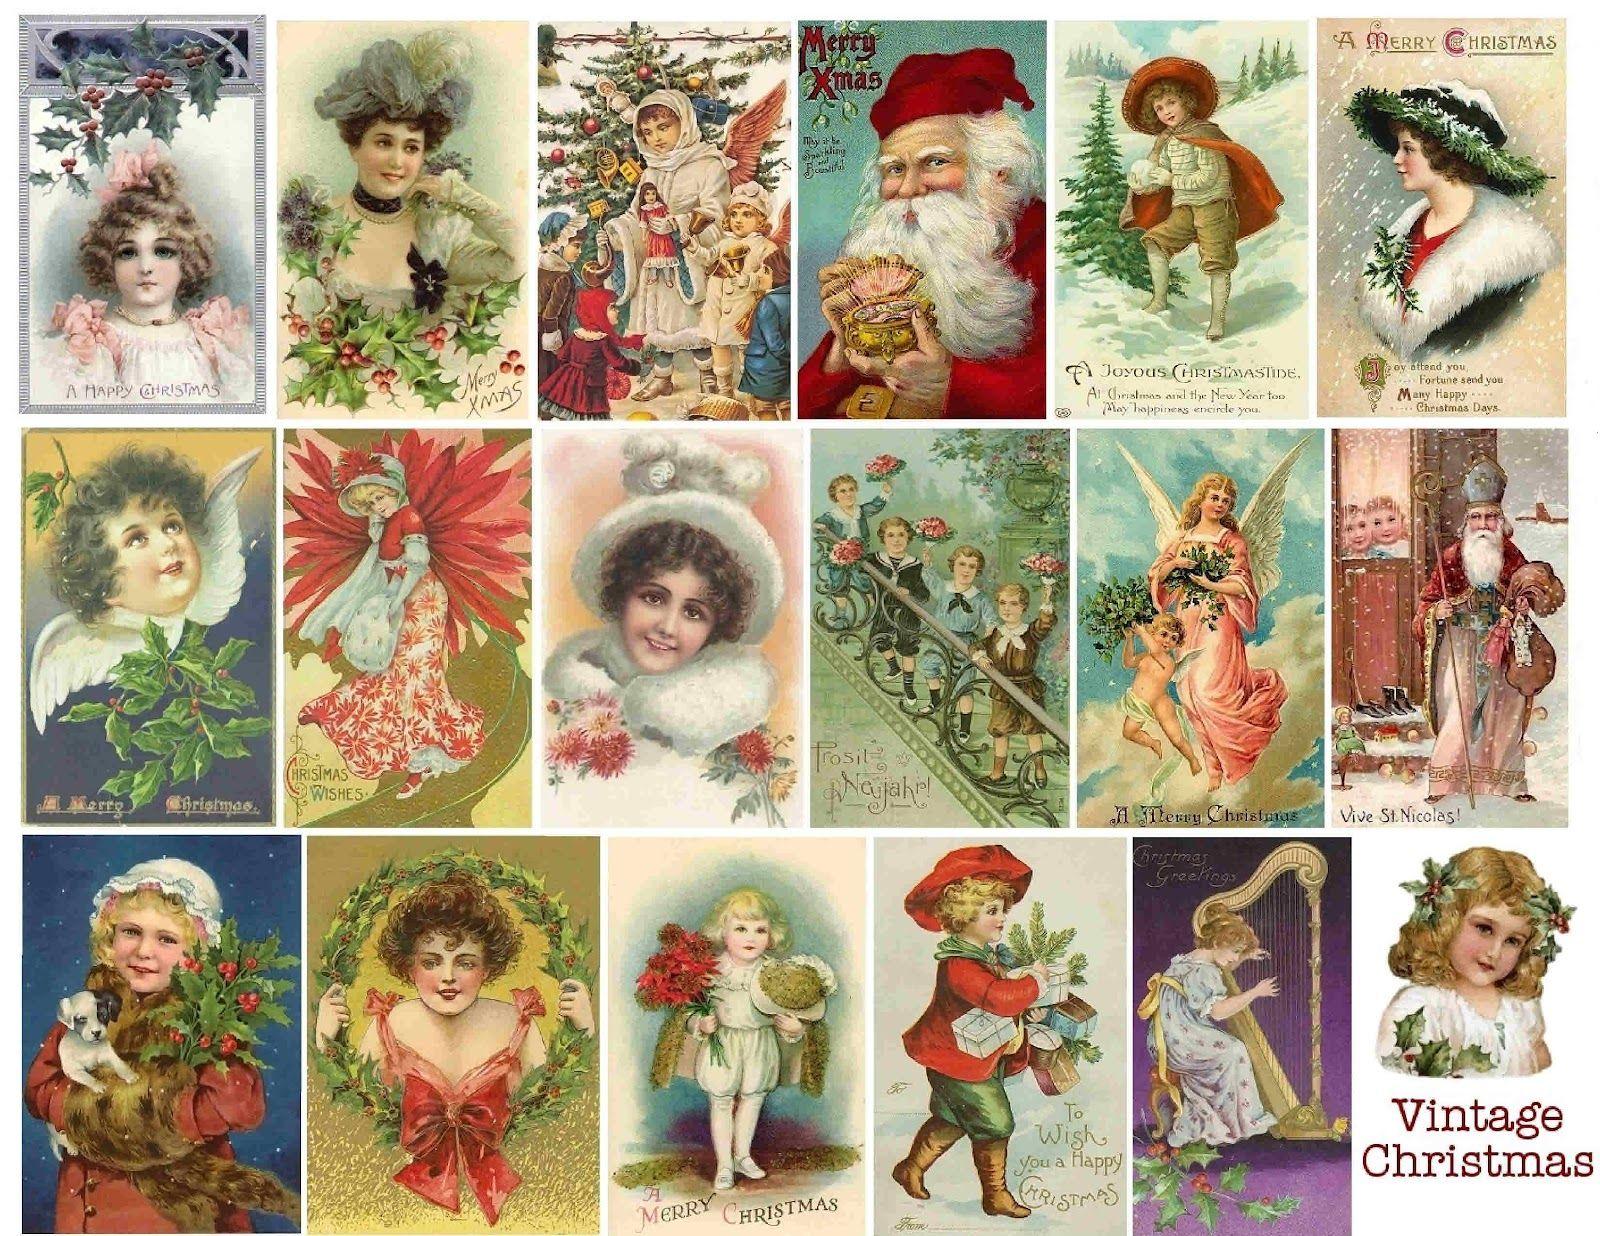 Scrapbook+Christmas+Vintage+Free+Printable   Free Vintage Printable - Free Printable Christmas Photo Collage